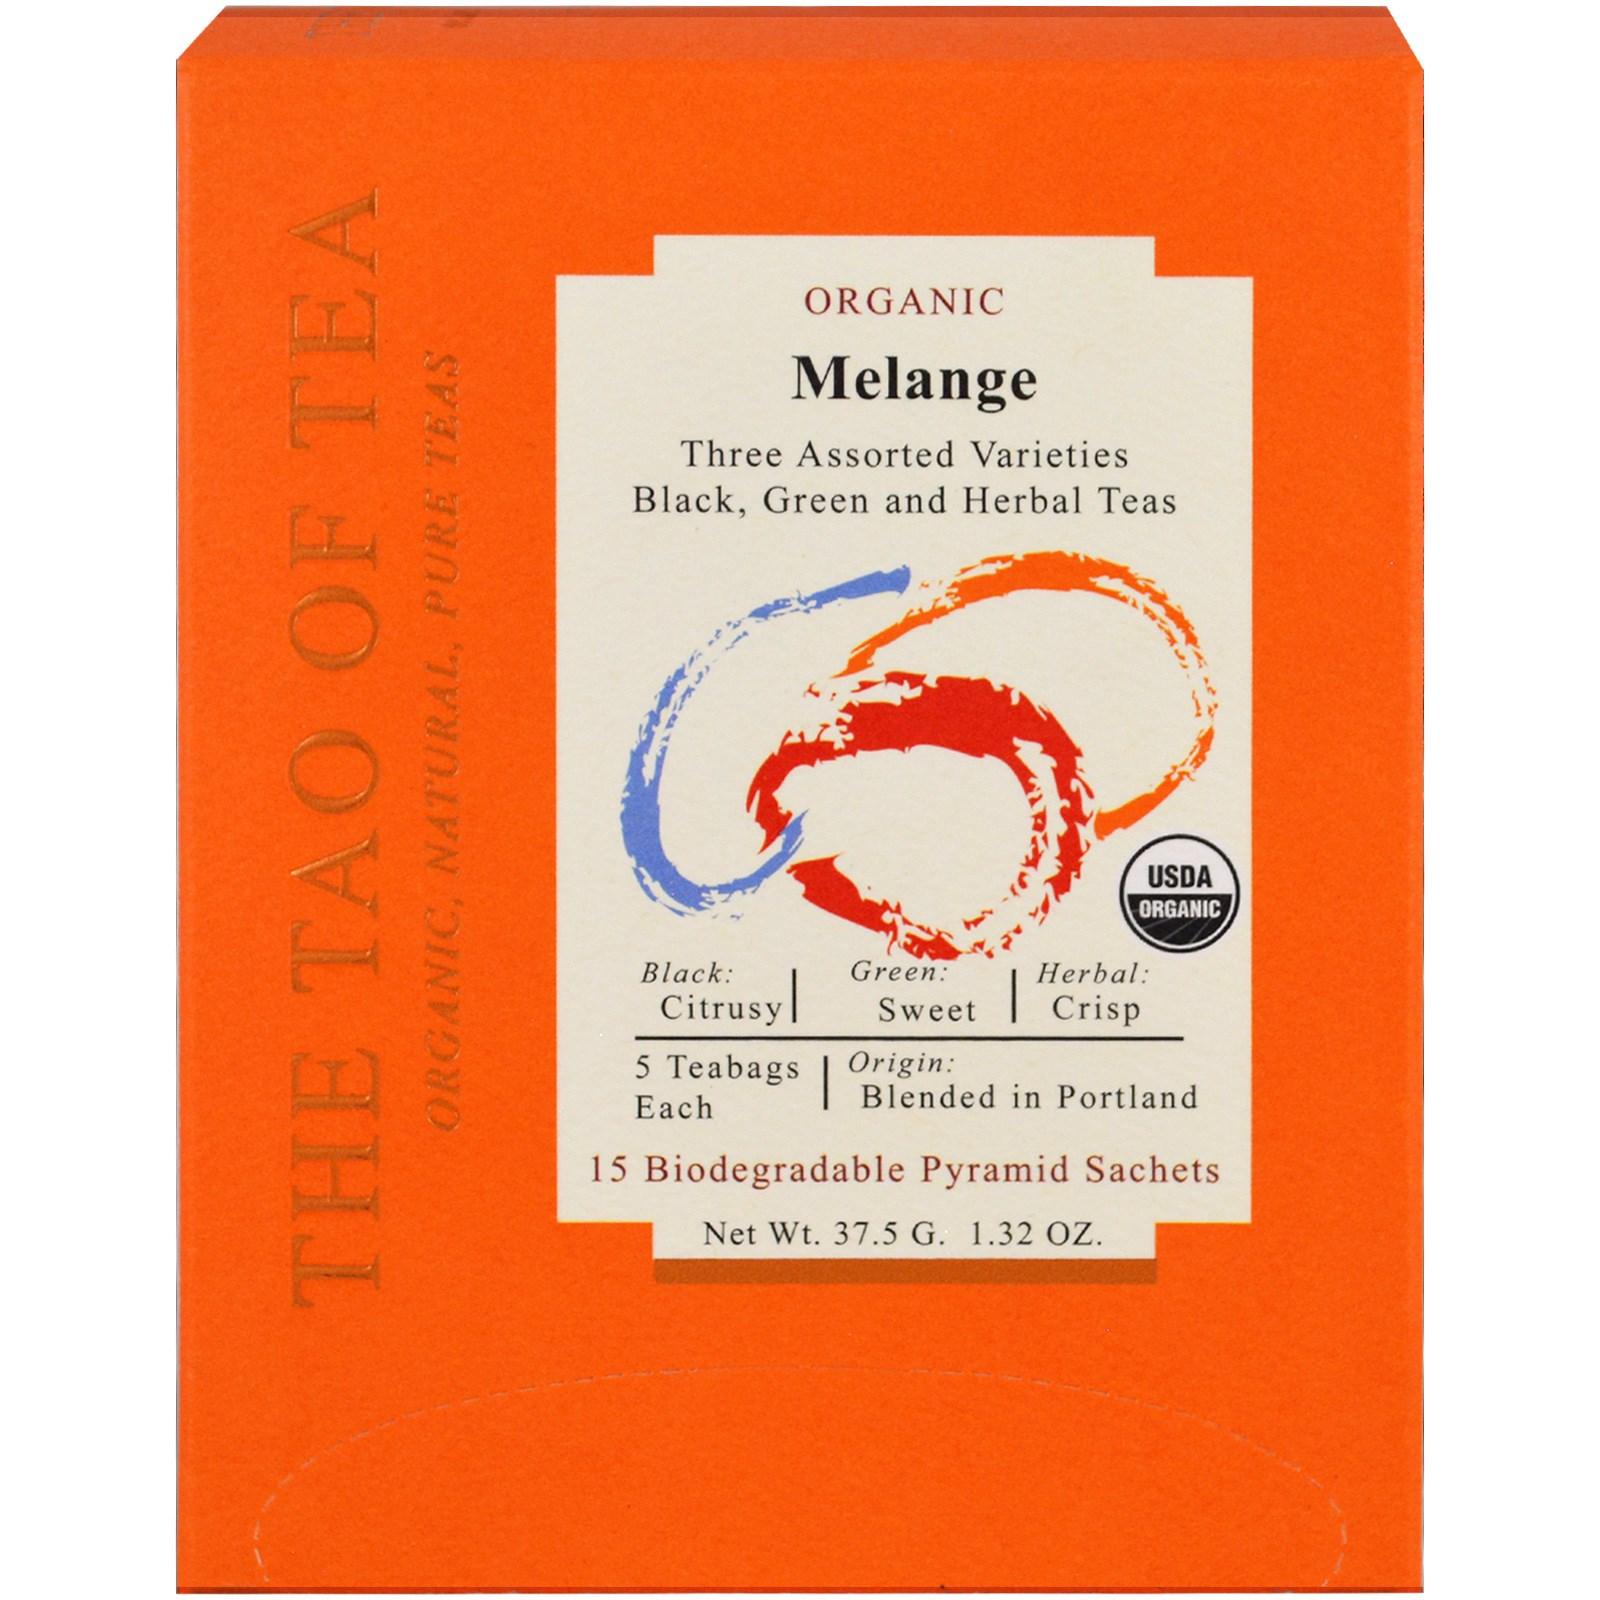 The Tao of Tea, Органический меланж, три разновидности в ассортименте, 15 пакетиков-пирамидок, 1,32 унц. (37,5 г)